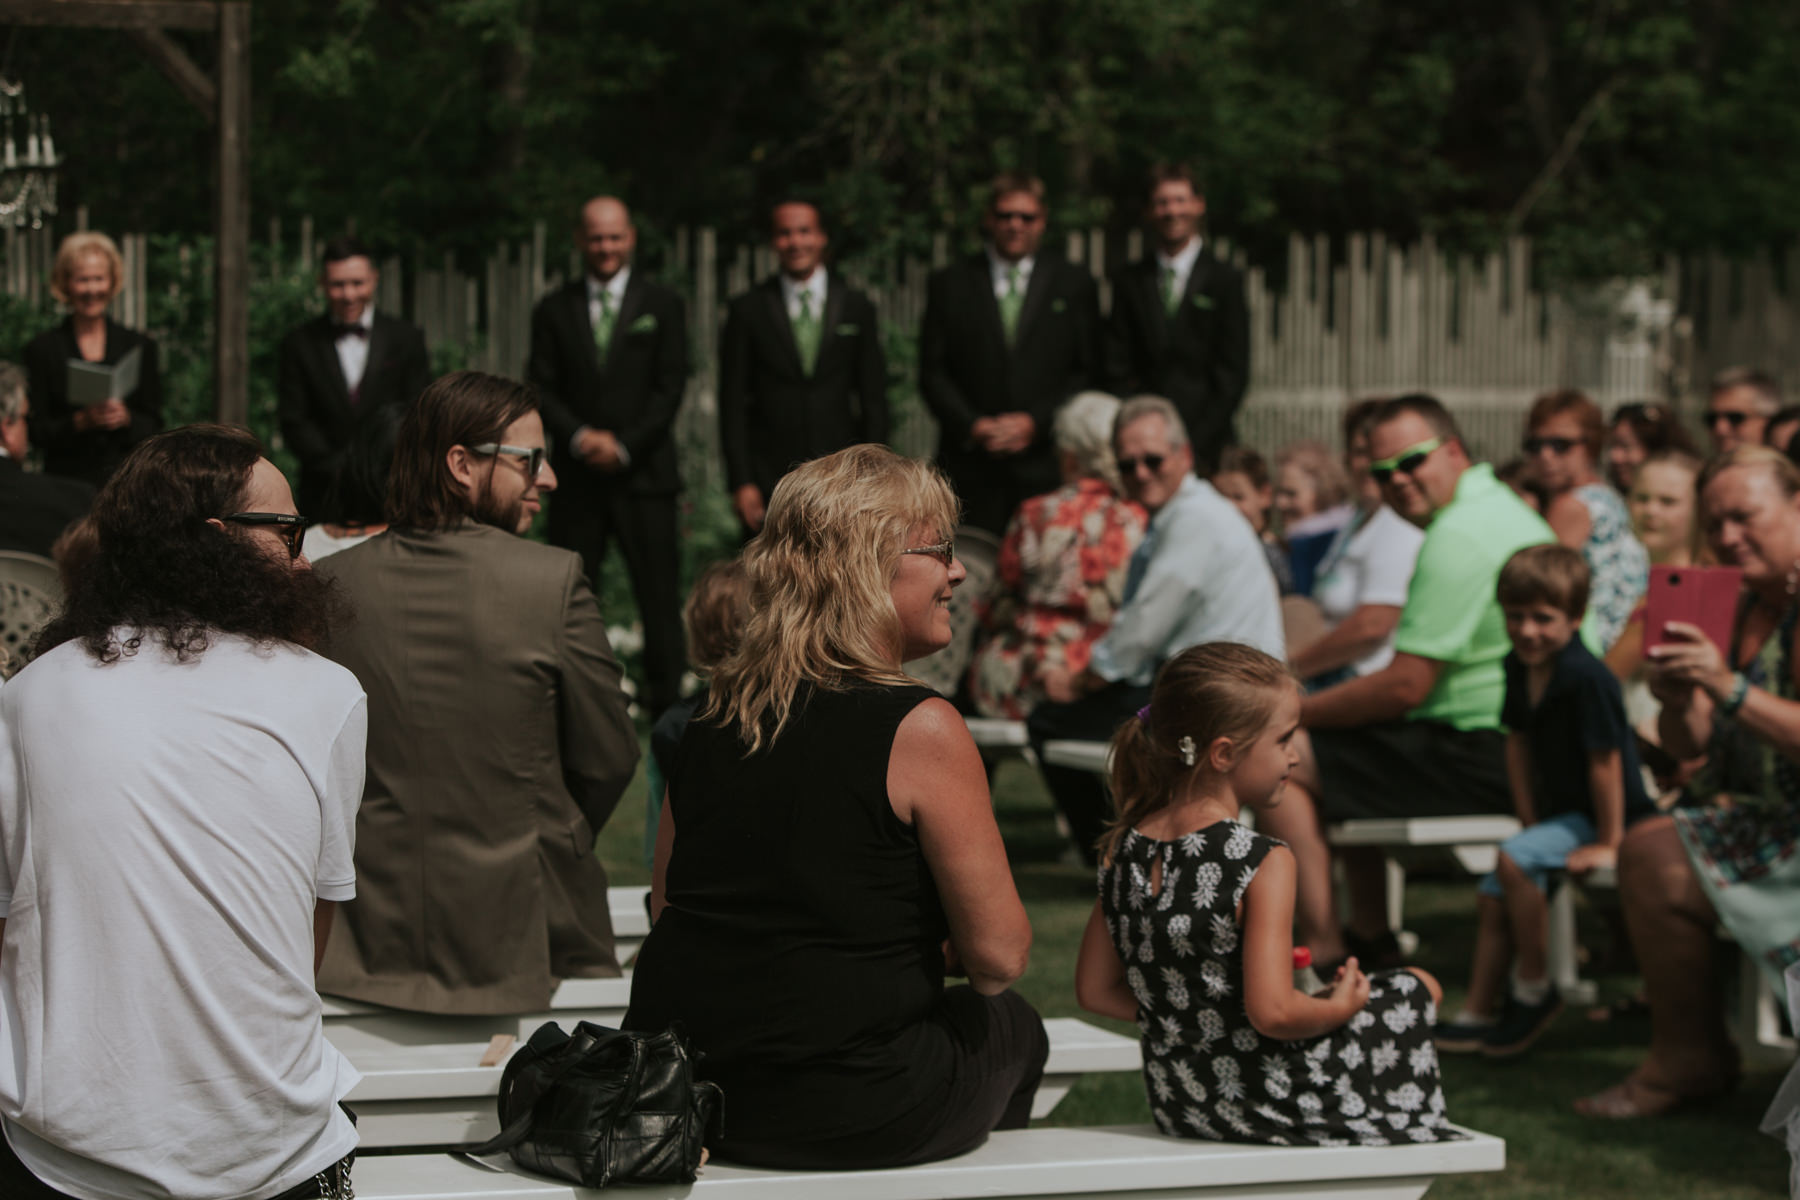 Vancouver Wedding Photographer Pam (21).jpg